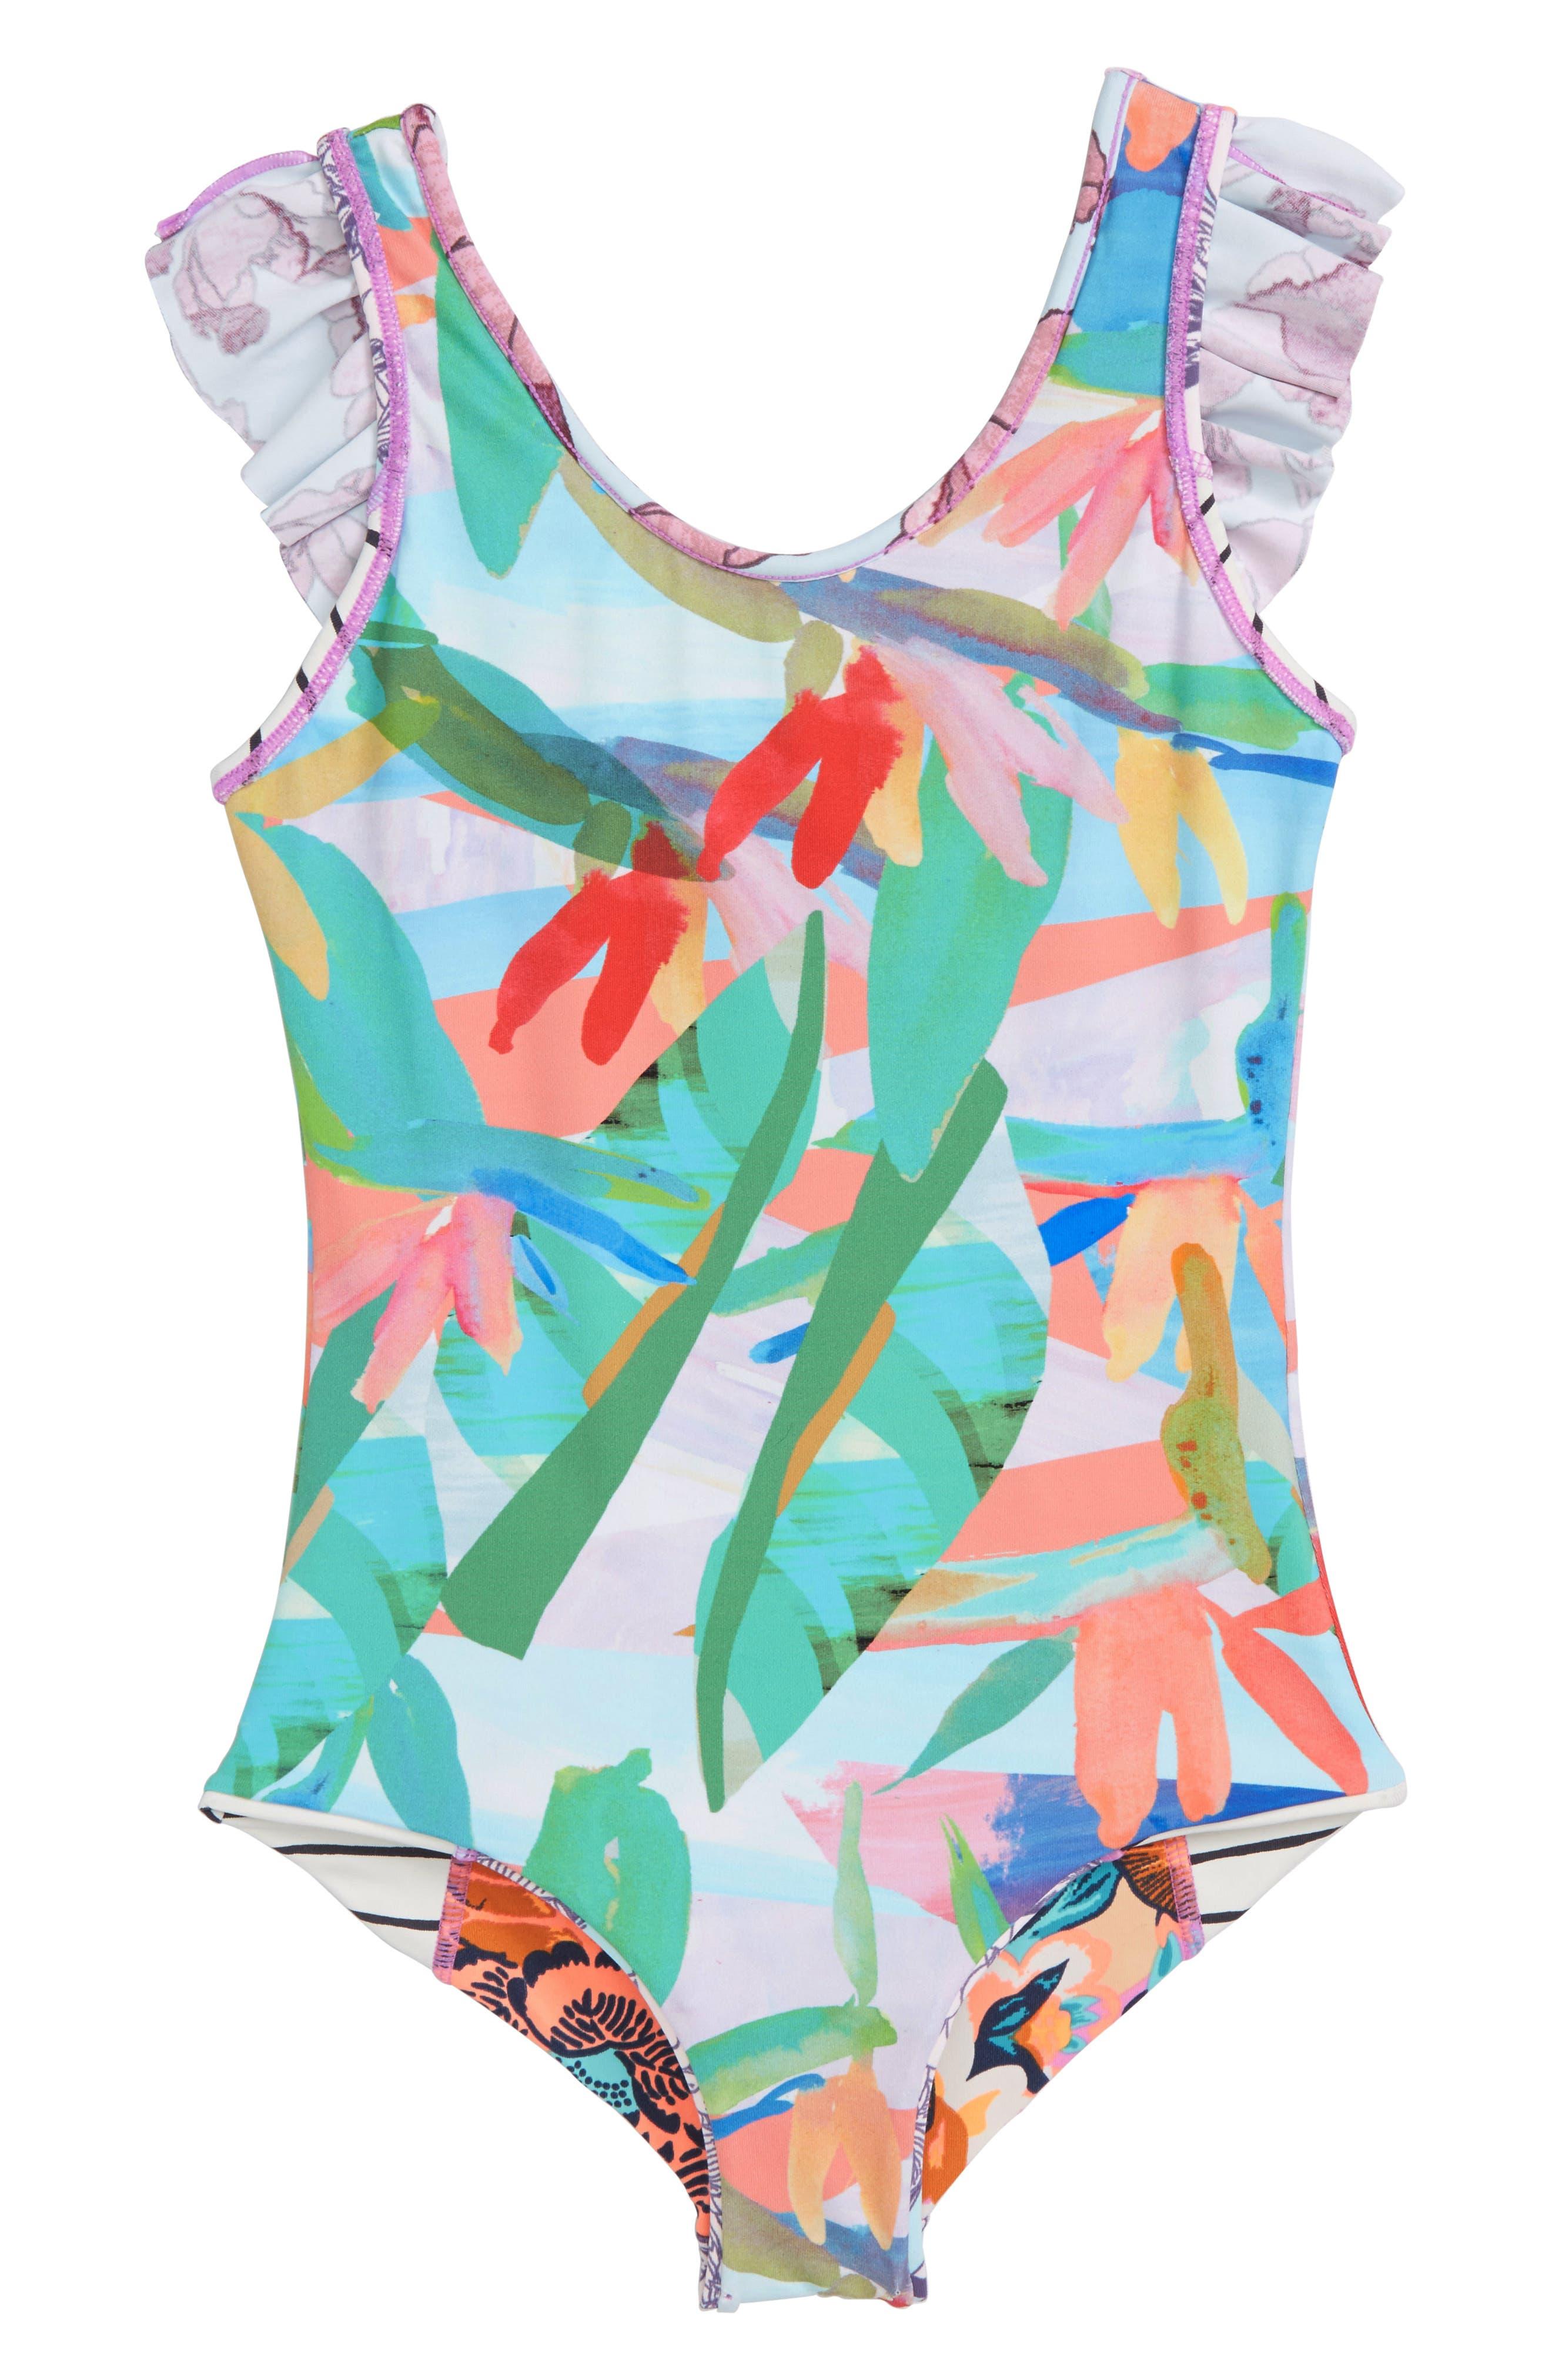 Heavenly Frills Reversible One-Piece Swimsuit,                             Alternate thumbnail 2, color,                             Multicolor